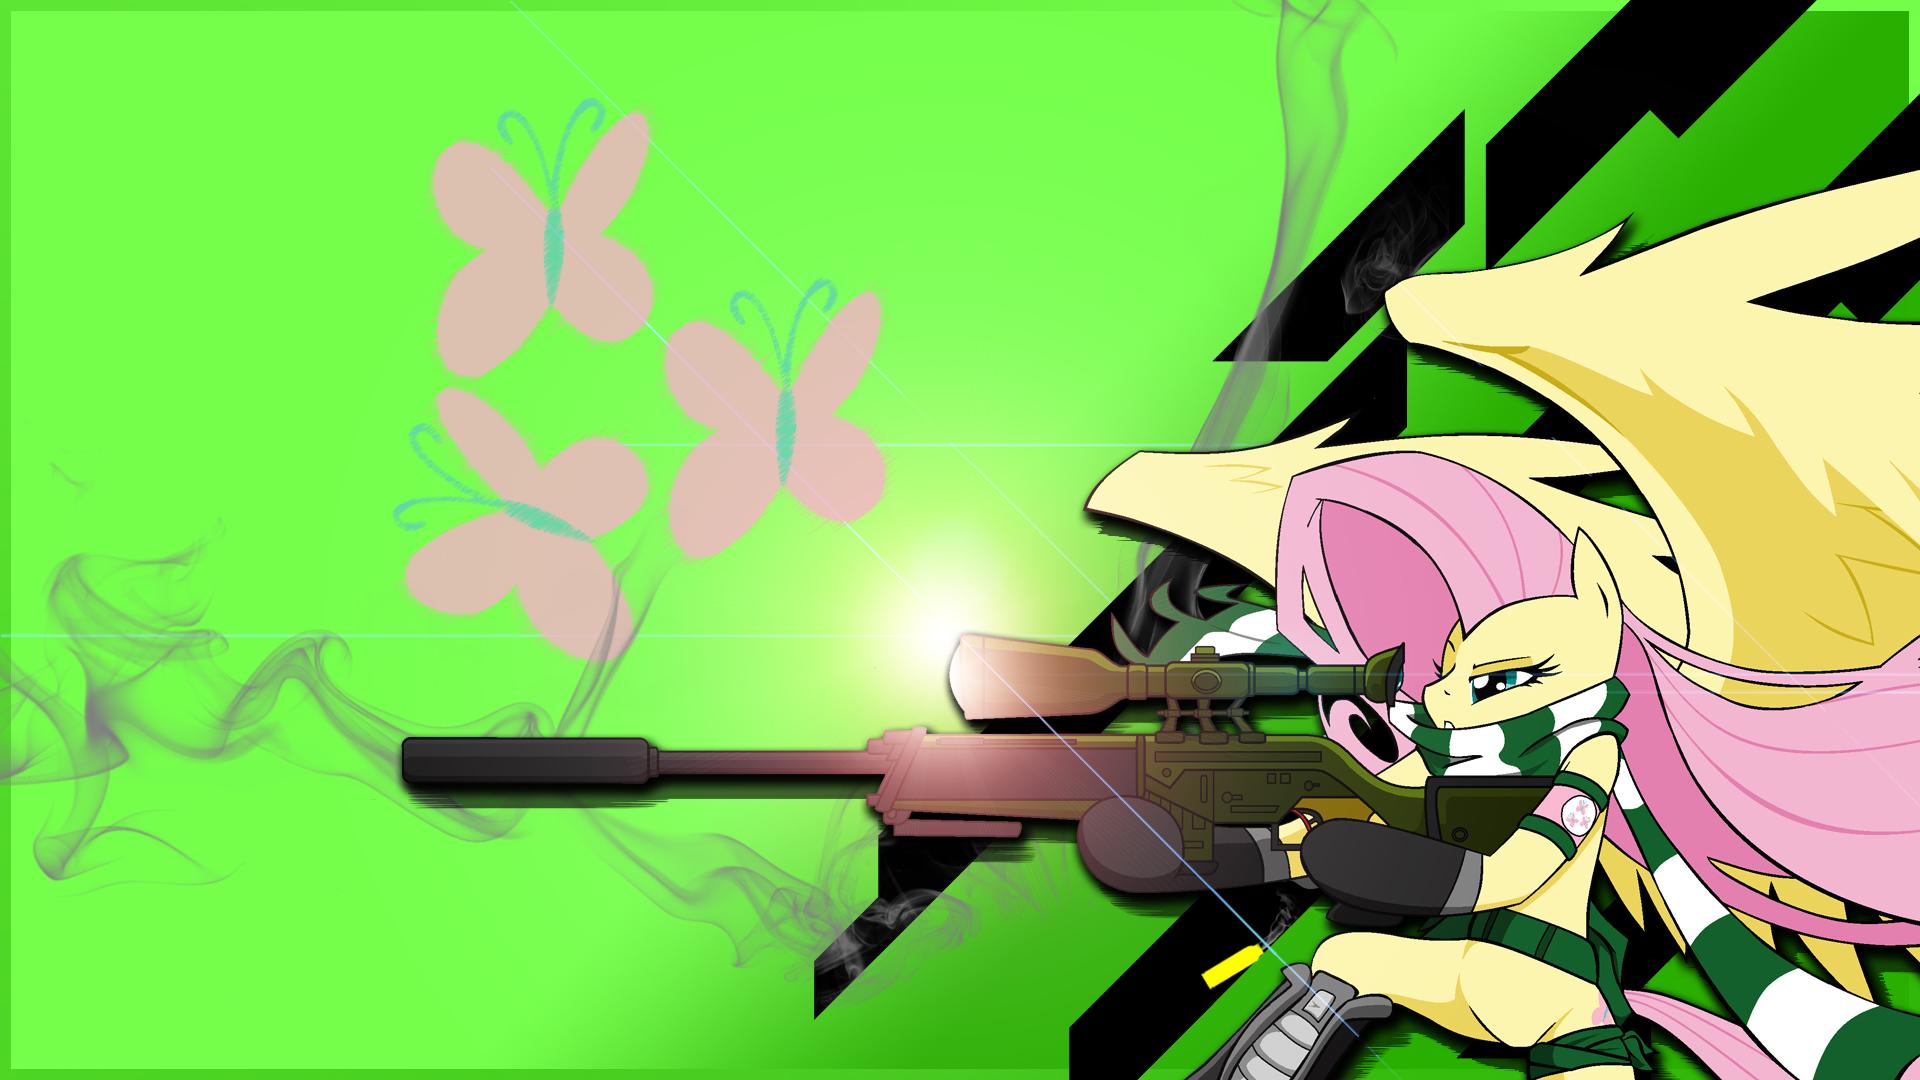 Snipershy by RikiTheSuperZeldaFan